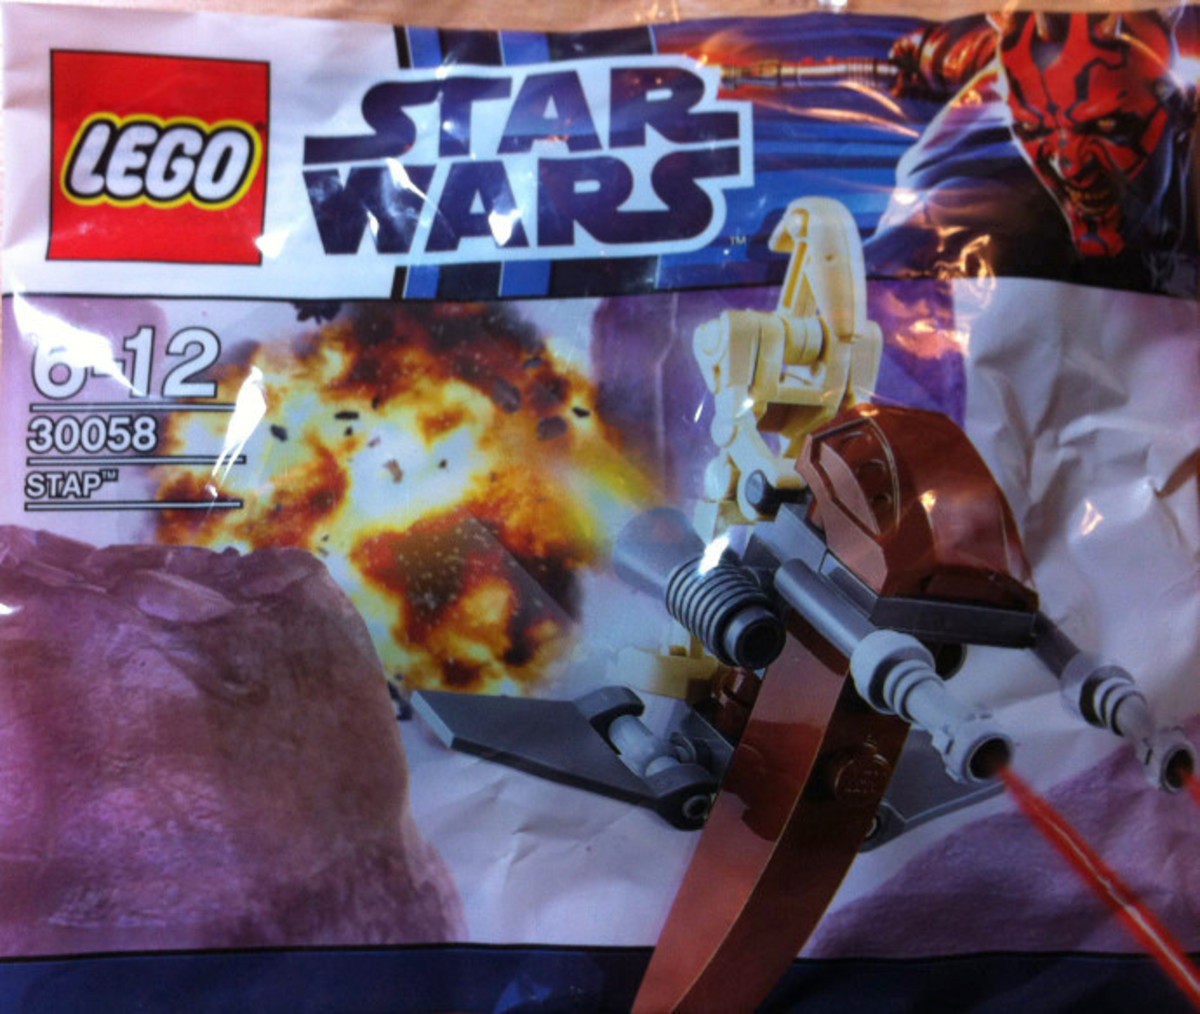 LEGO Star Wars STAP 30058 Bag